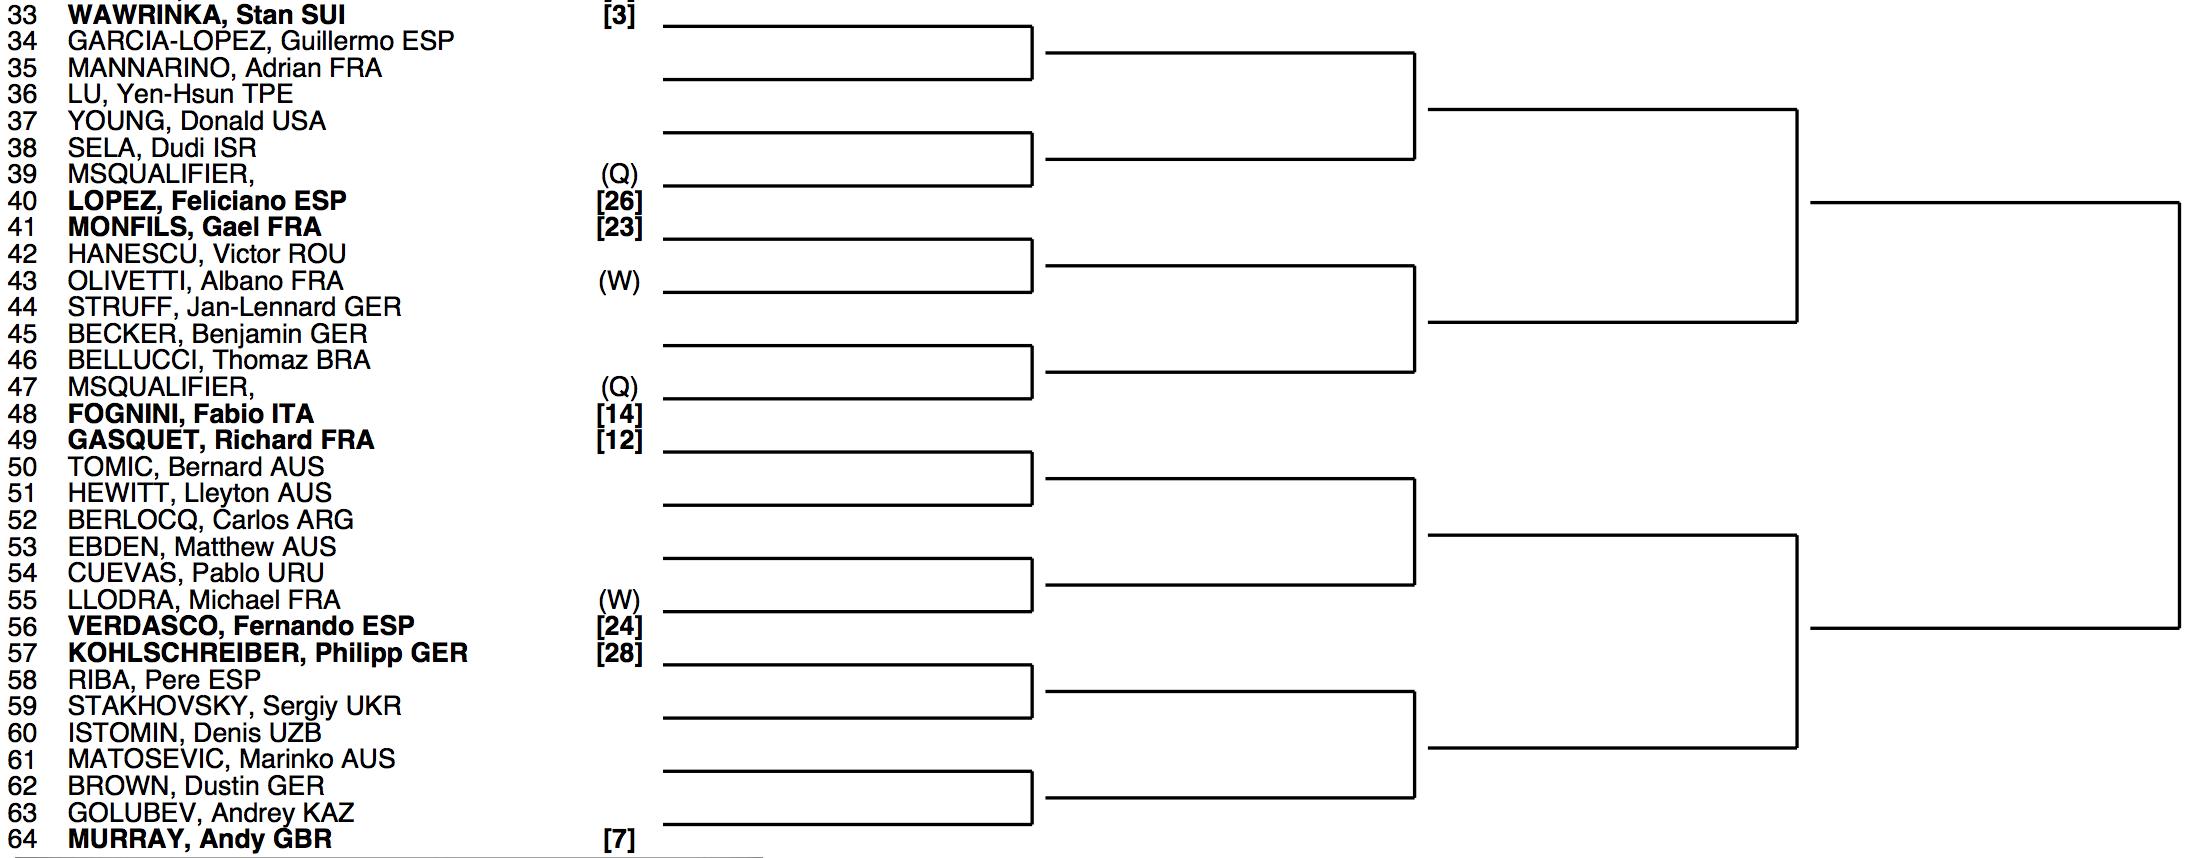 Roland Garros 2014 Draw 2:4